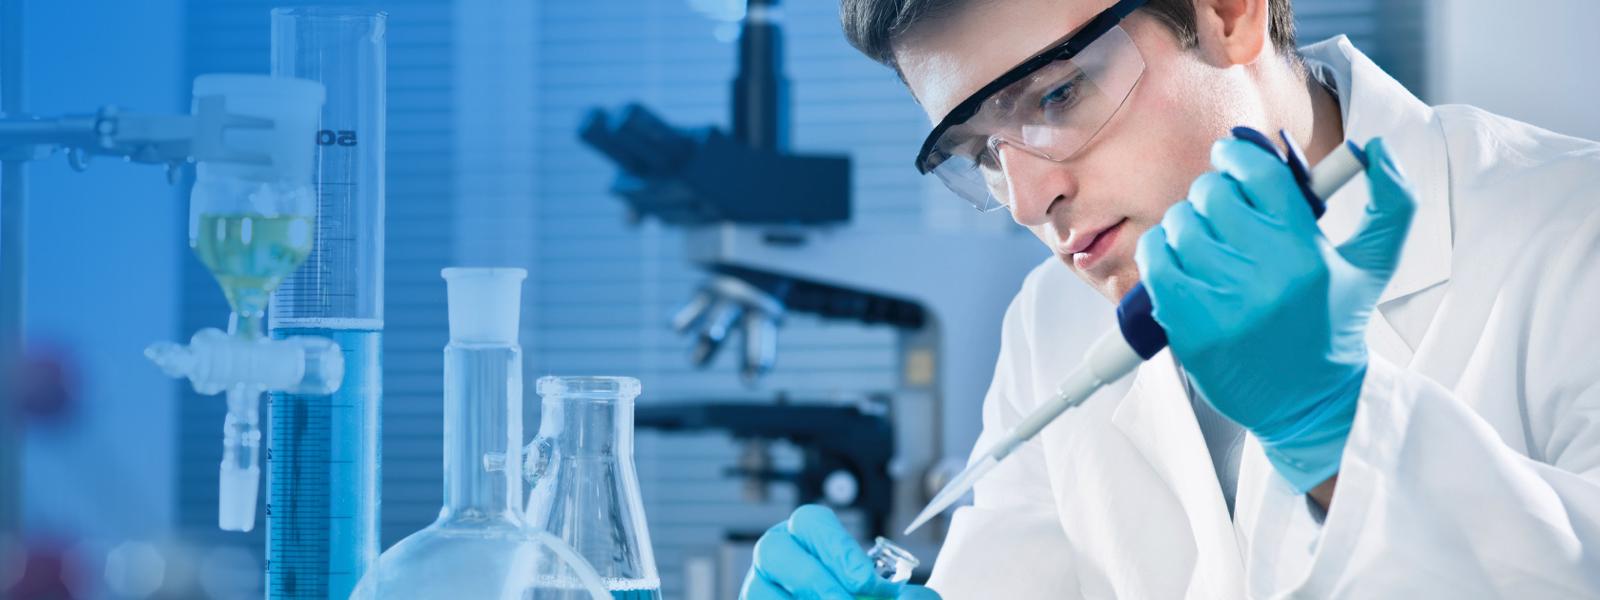 trabalho-cientifico-crf-sp